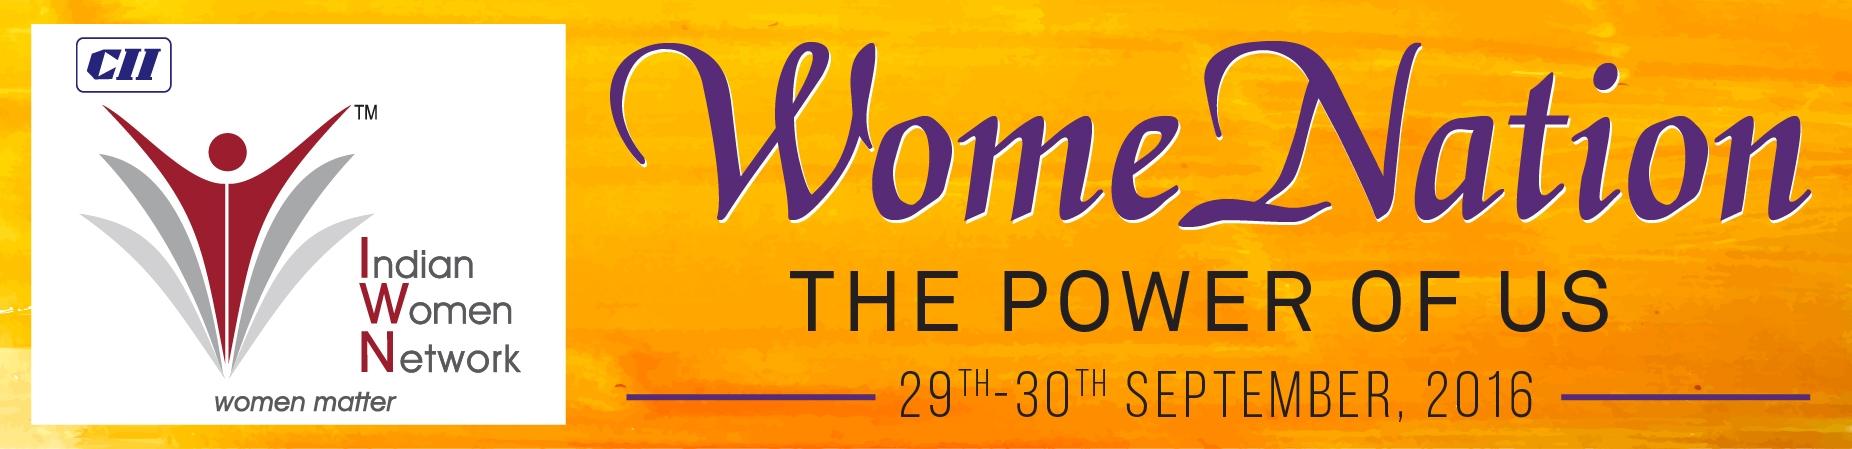 Womenation: Power of us